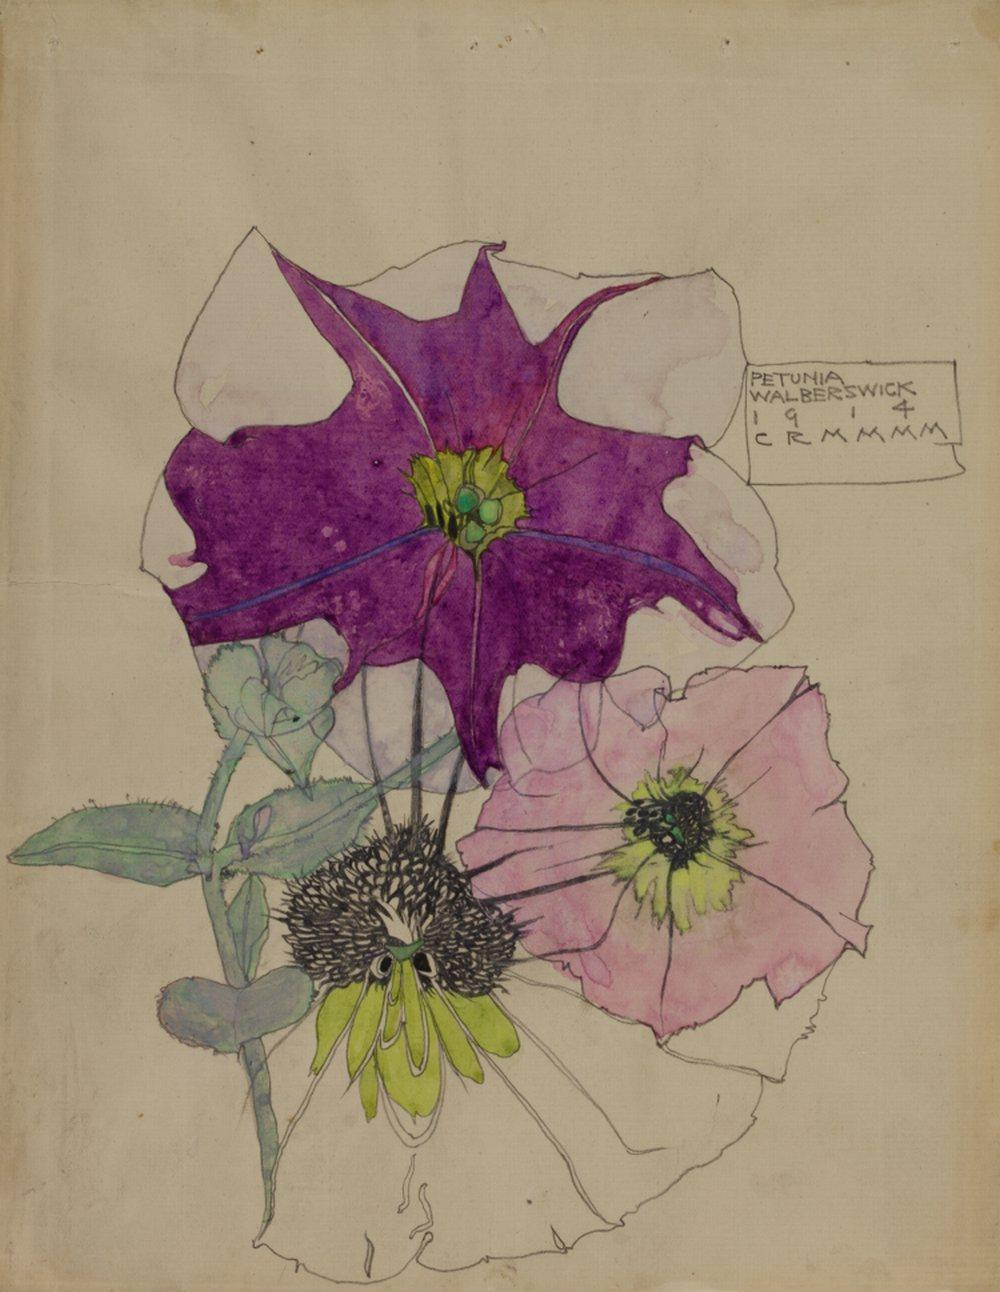 Petunia-Walberswick1914-Source-The-Hunterian-Museum-Art-Gallery-University-of-Glasgow.jpg